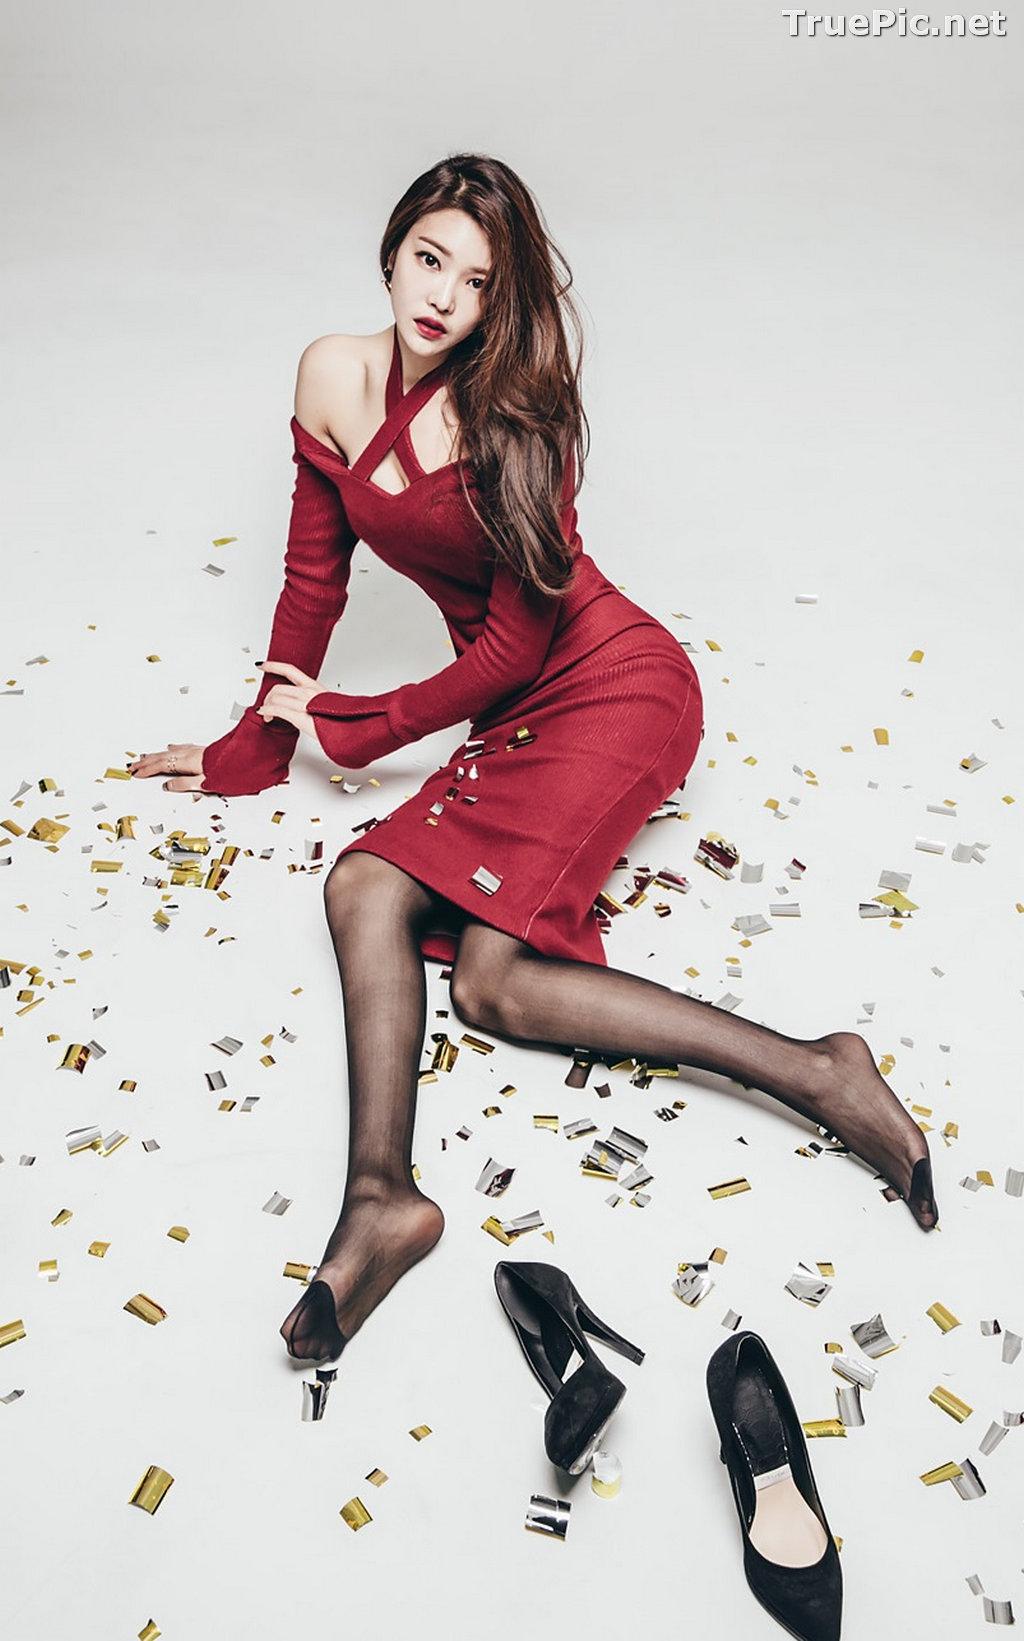 Image Korean Beautiful Model – Park Jung Yoon – Fashion Photography #11 - TruePic.net - Picture-26